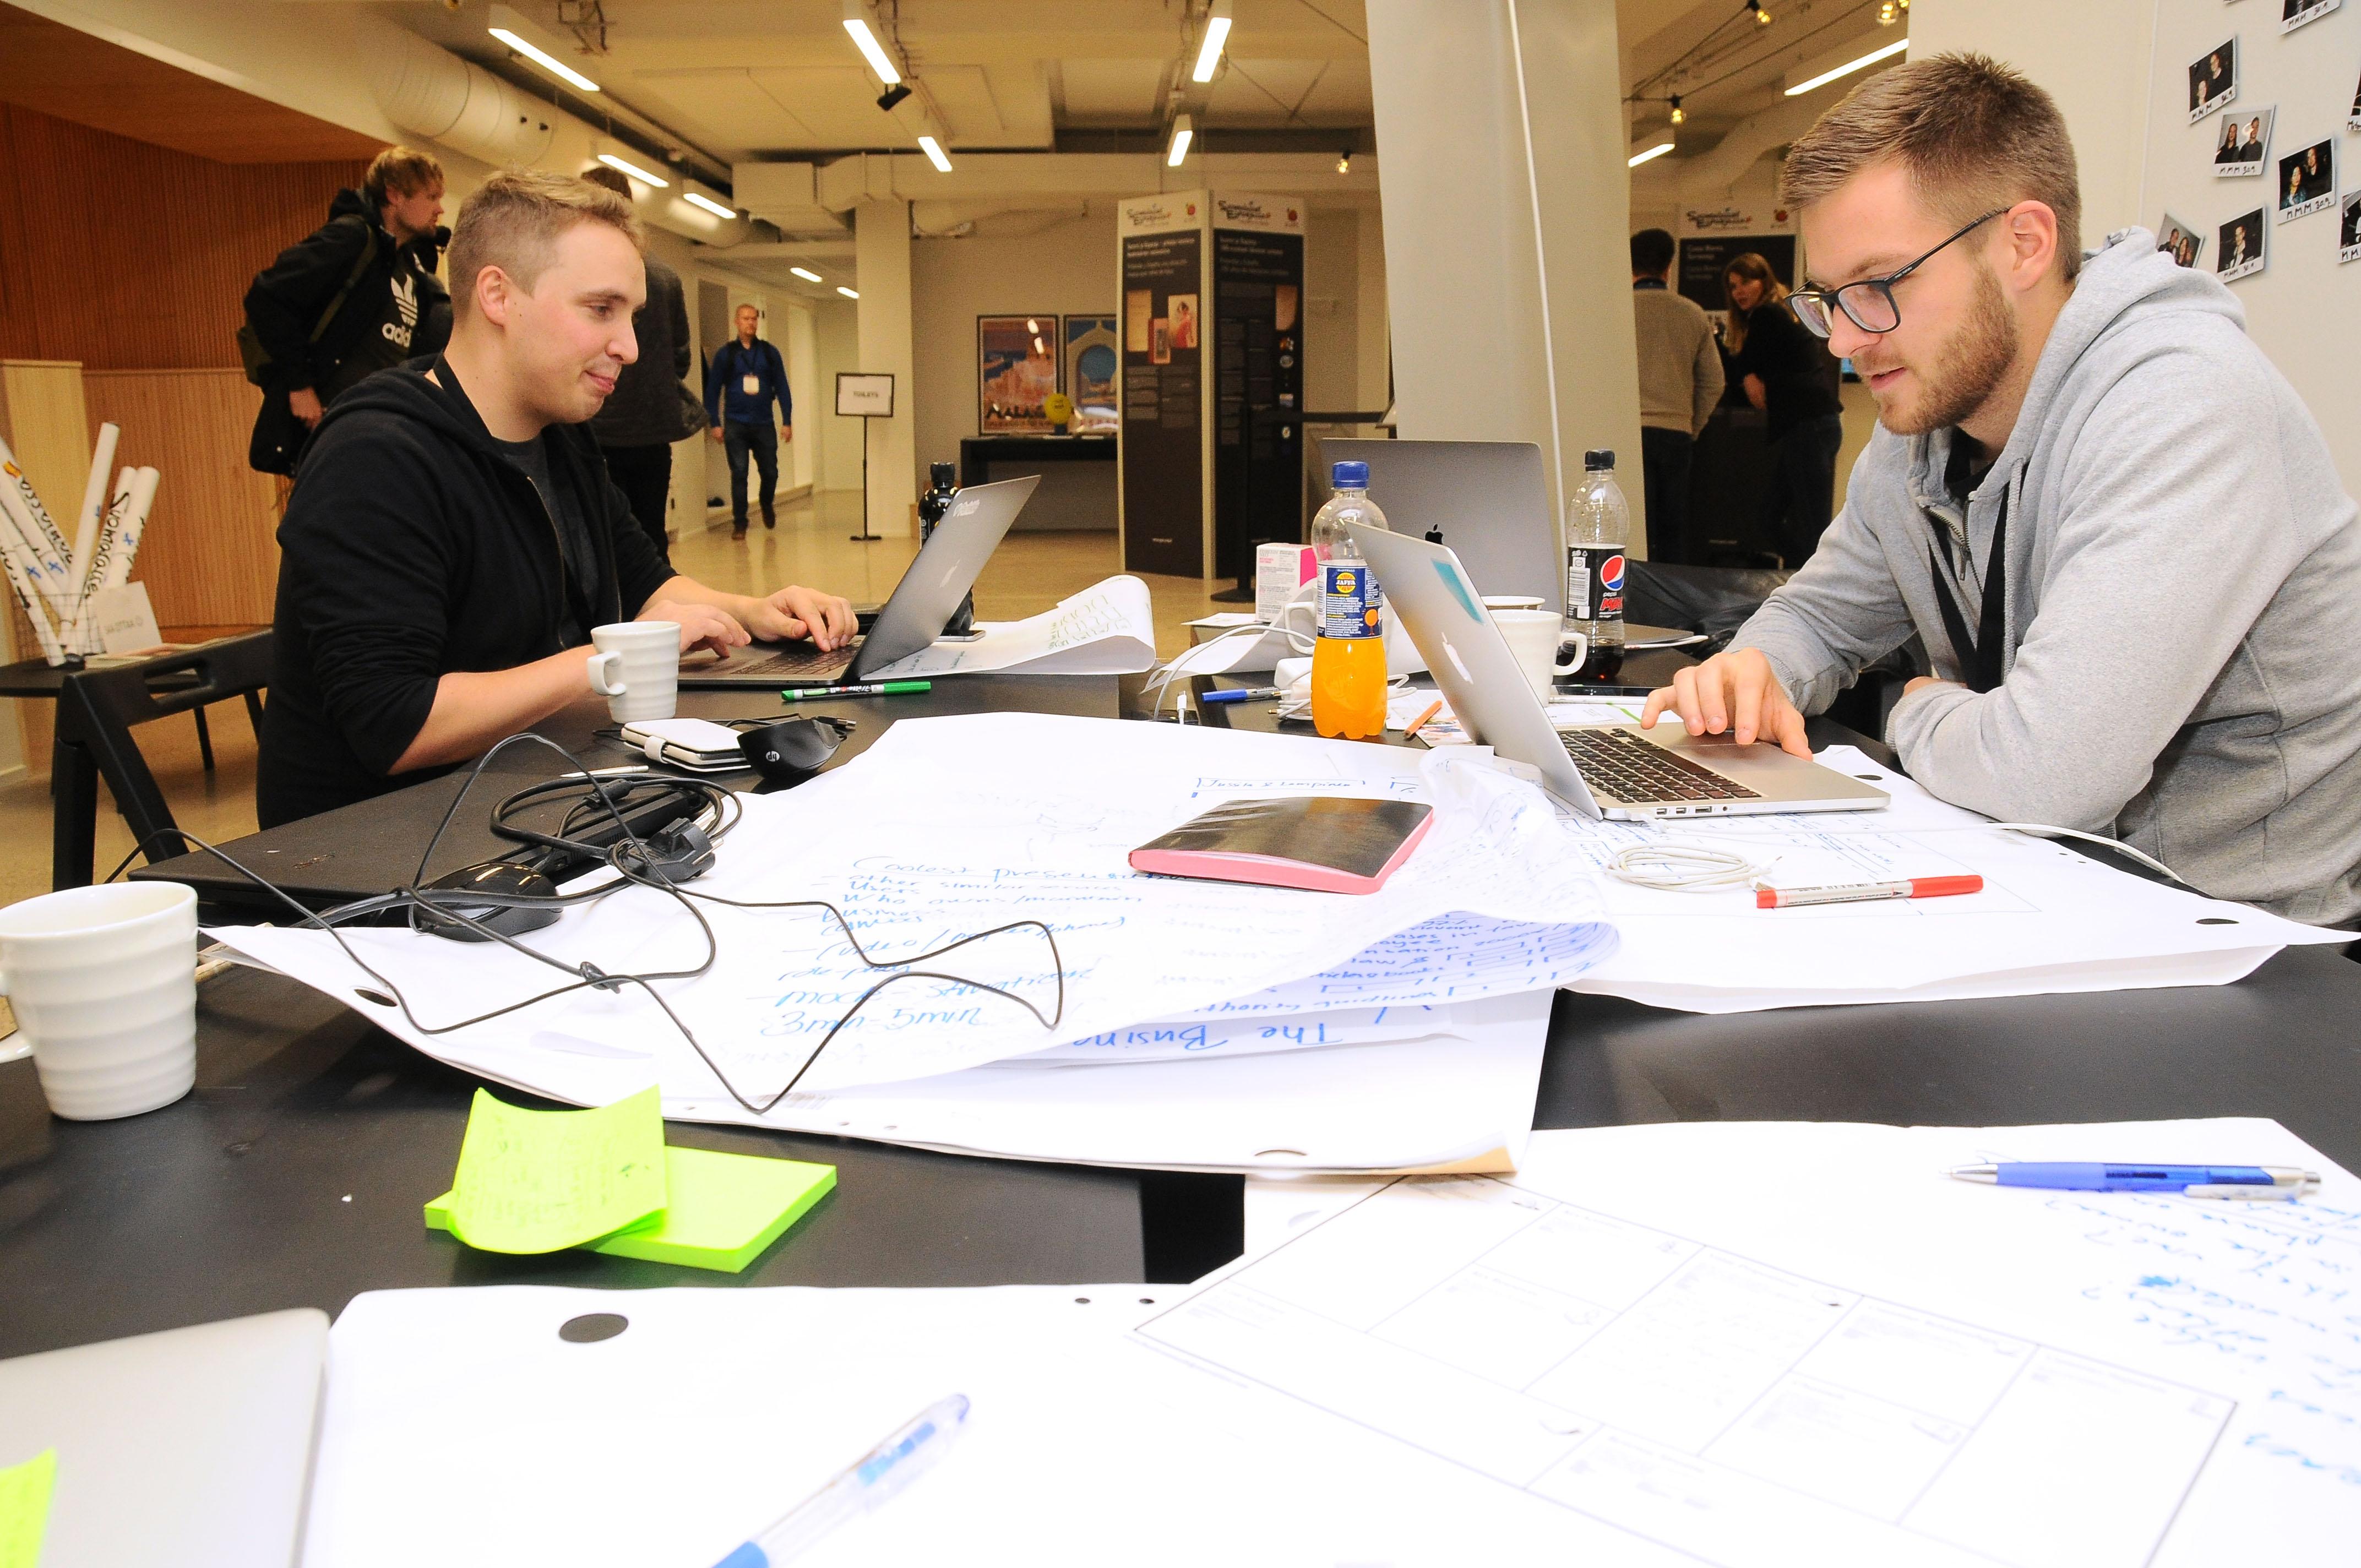 Felix and Olli working on laptops